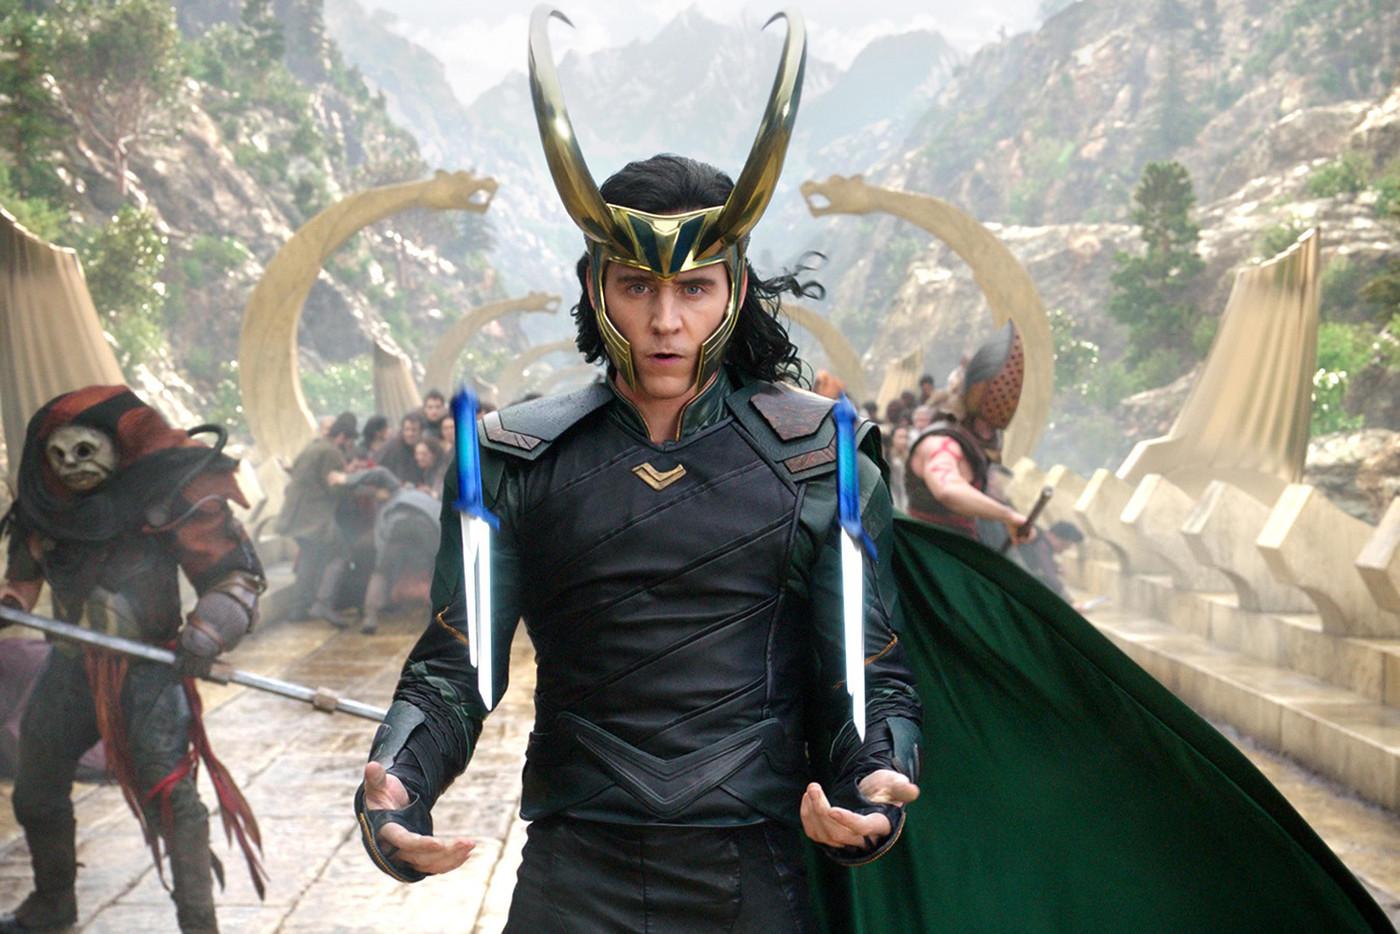 《Avengers: Endgame》导演确认「2012 年 Loki」的命运